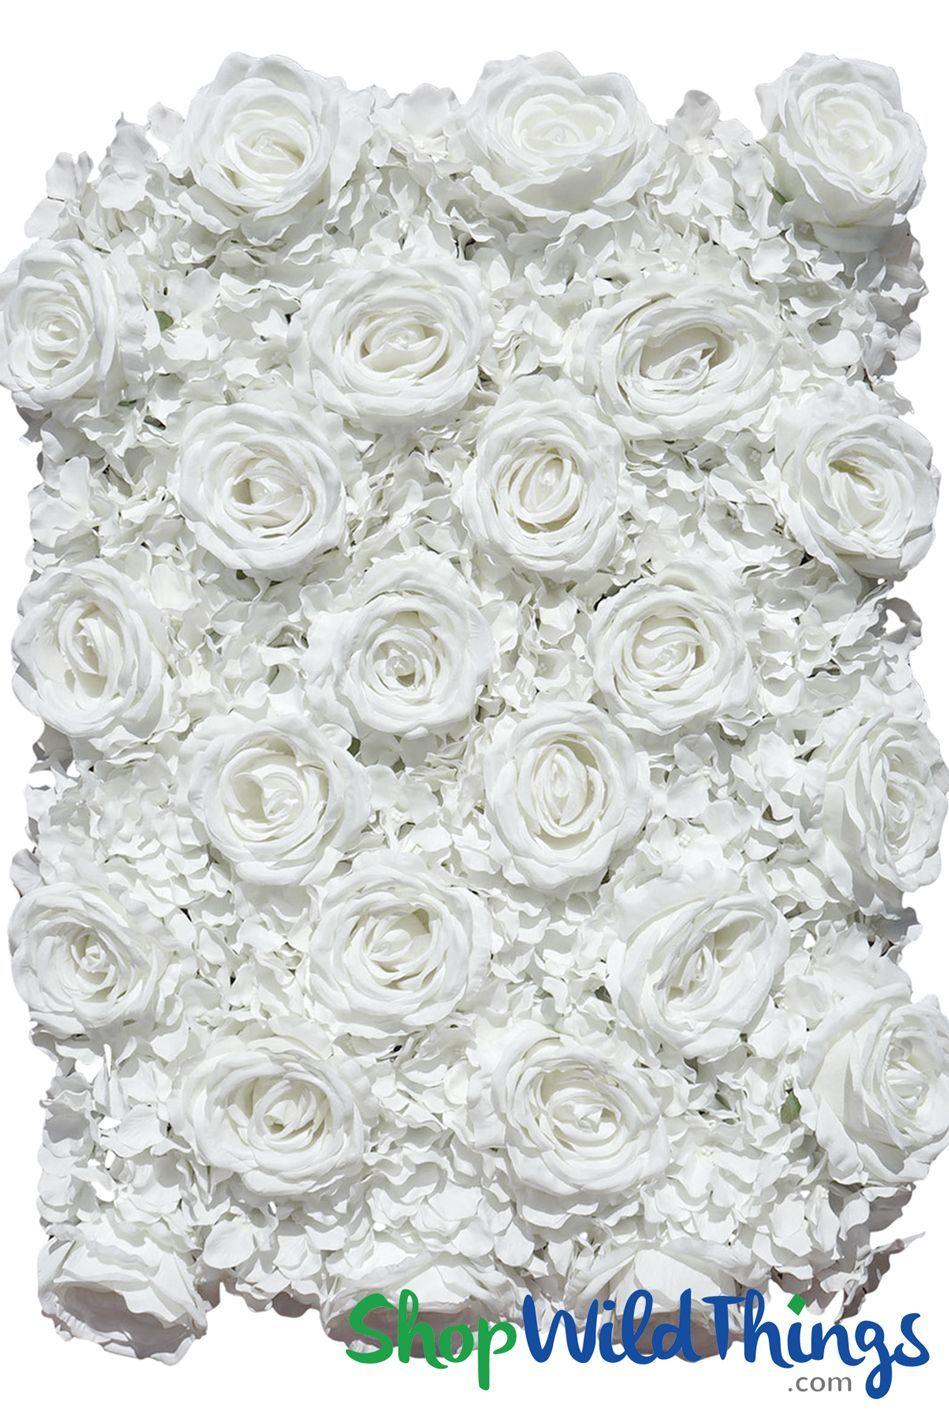 Flower Wall 19 X 25 1 2 Premium Silk Roses Hydrangeas Pure White Flower Wall Wedding Flower Wall Flower Wall Backdrop